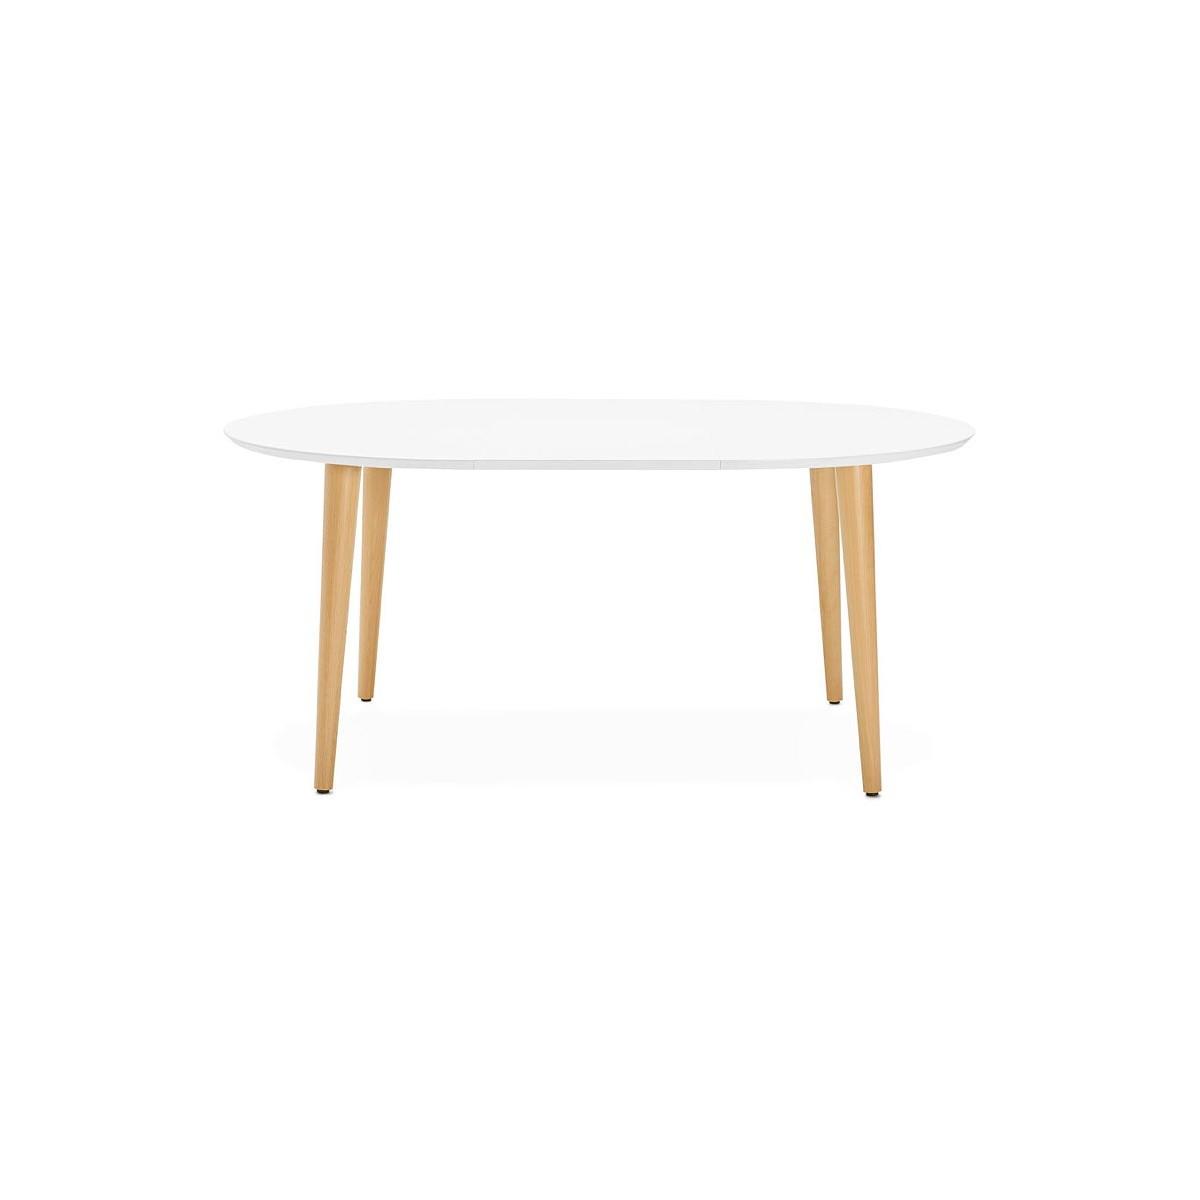 table a manger ronde scandinave a rallonges o 120 cm olivia en bois 120 220x120x75 cm blanc mat amp story 5748